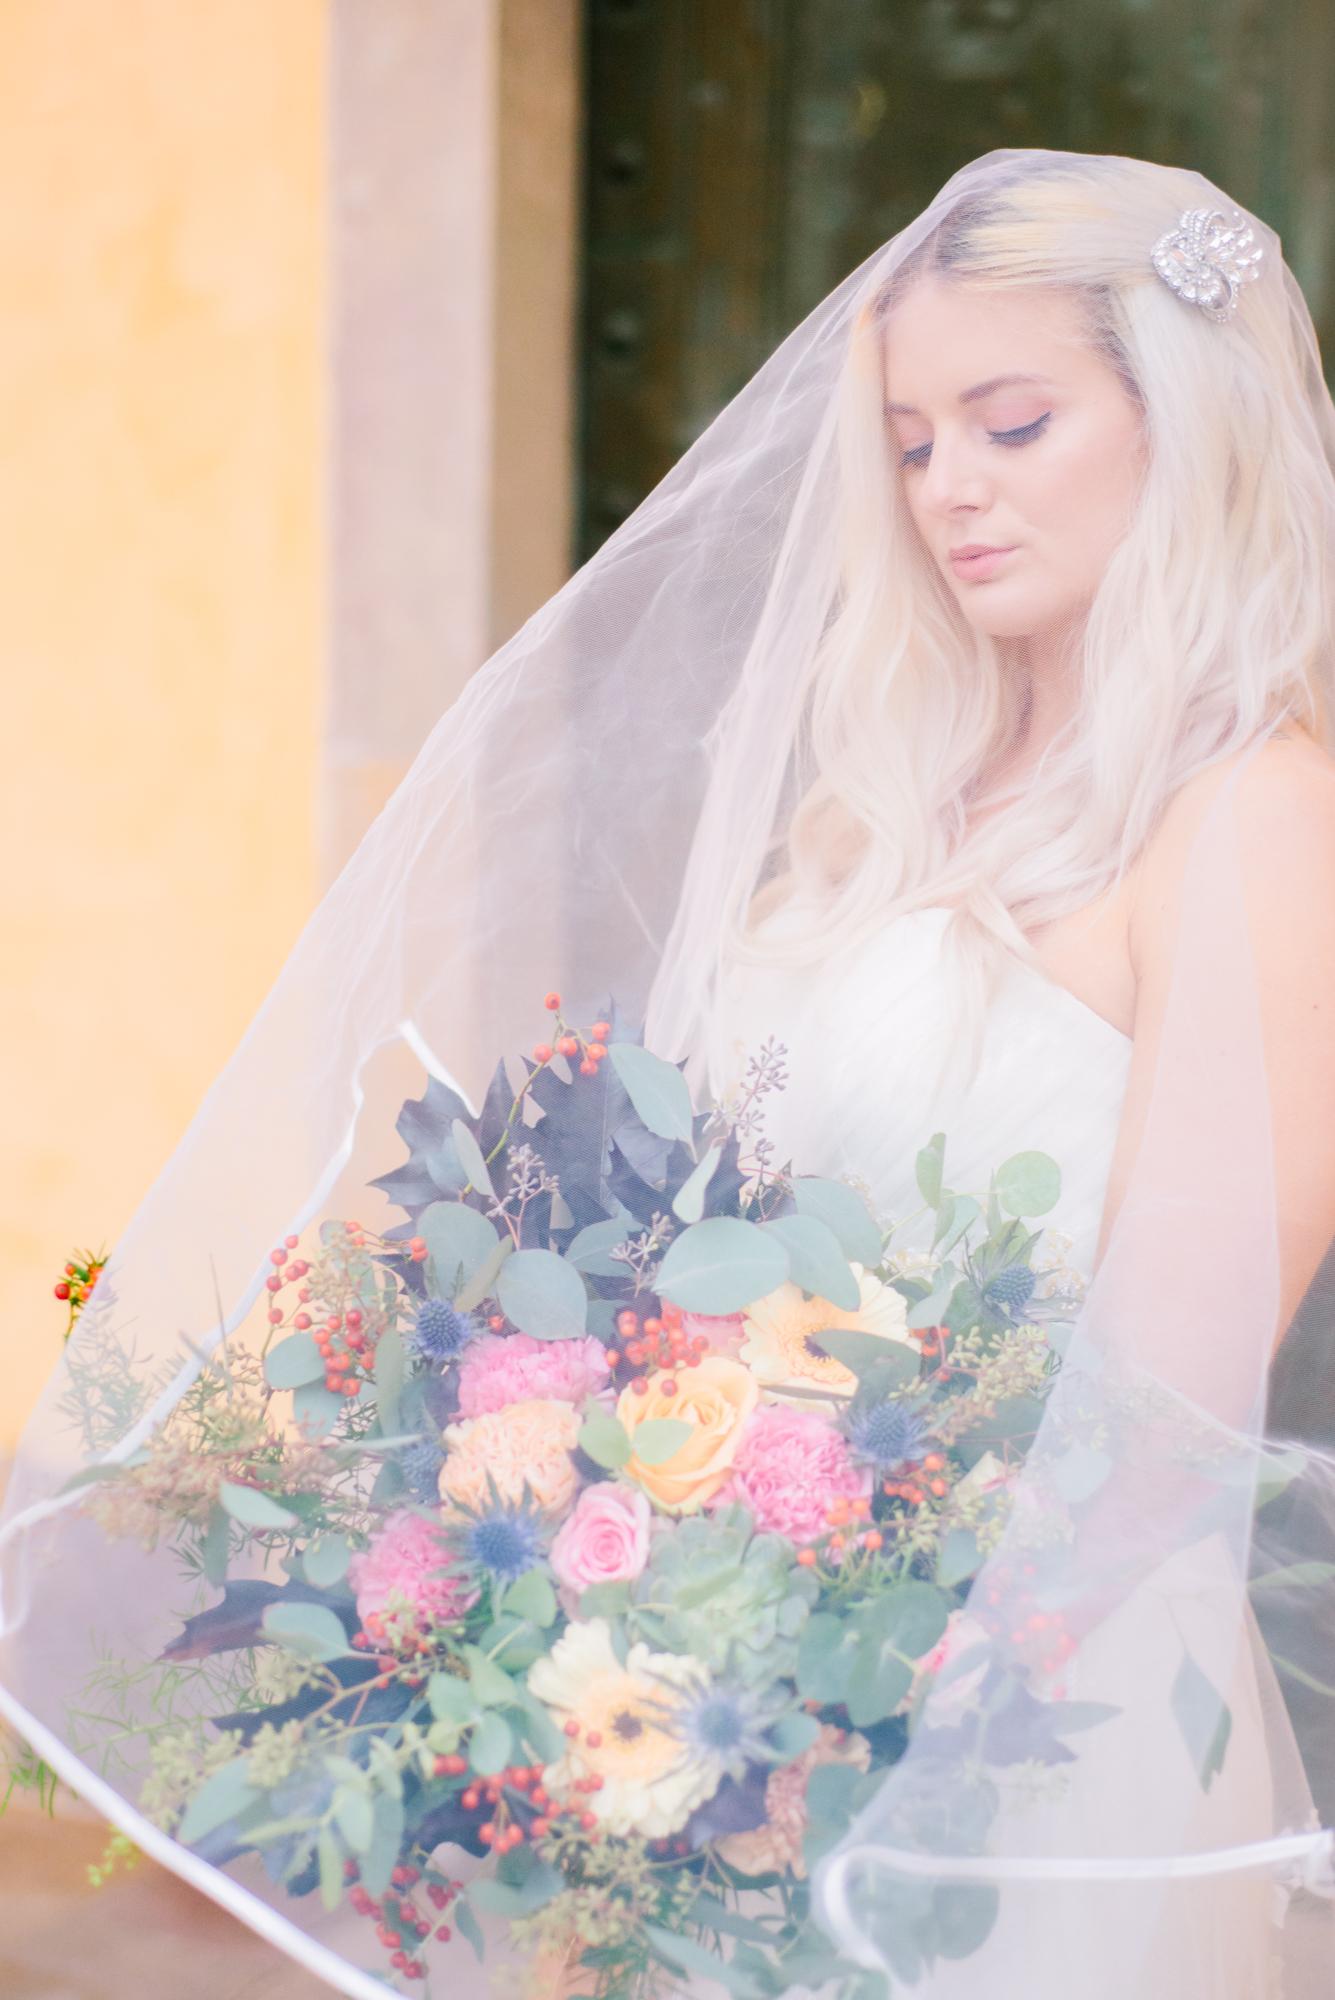 Elegant Organic Fall Swedish Bridal Wedding Styled Shoot - Erika Alvarenga Photography-75.jpg